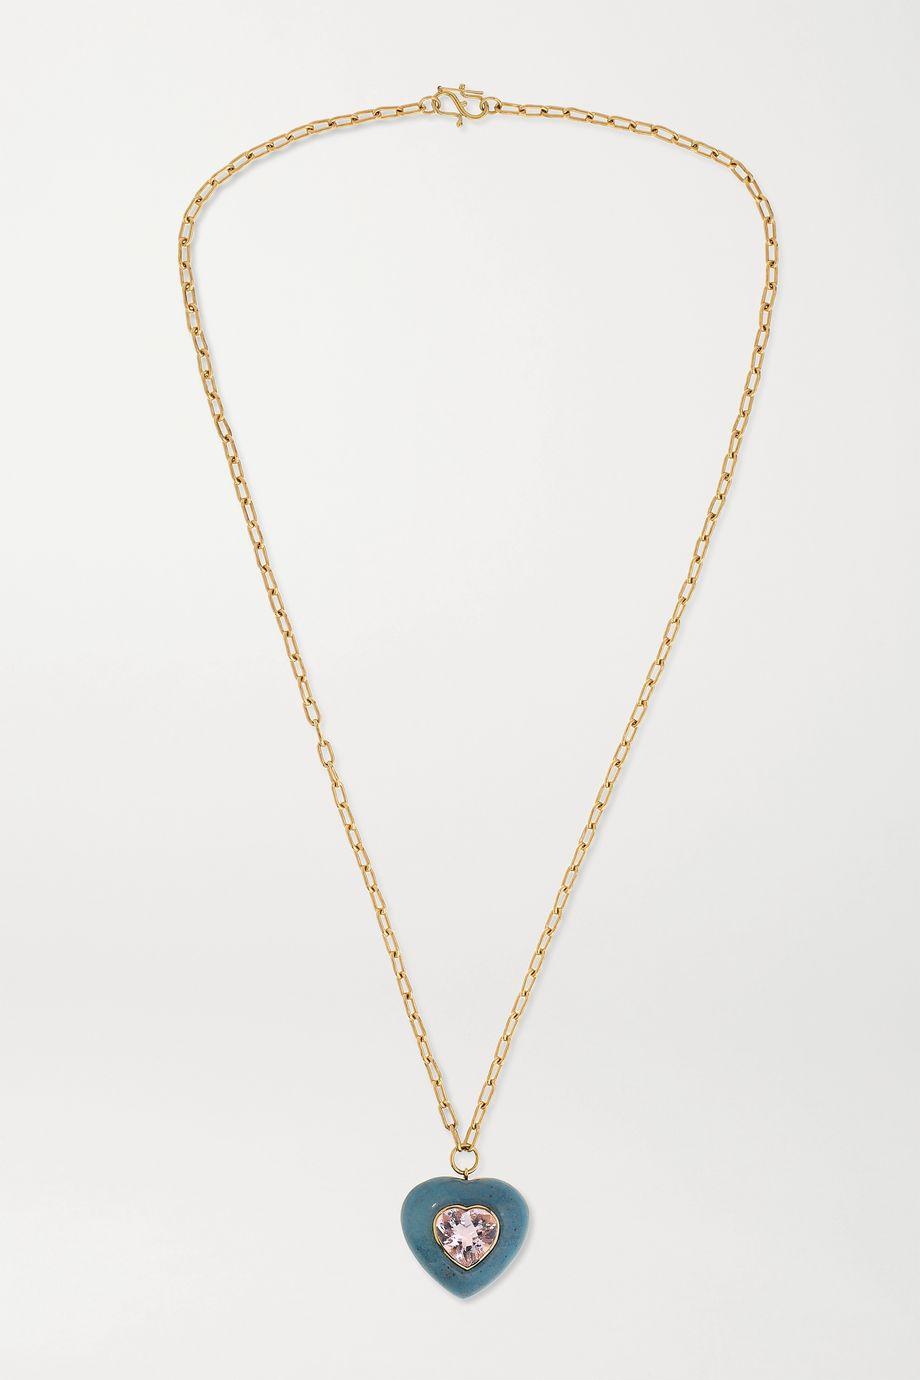 Retrouvaí Lollipop 14-karat gold, trolleite and morganite necklace